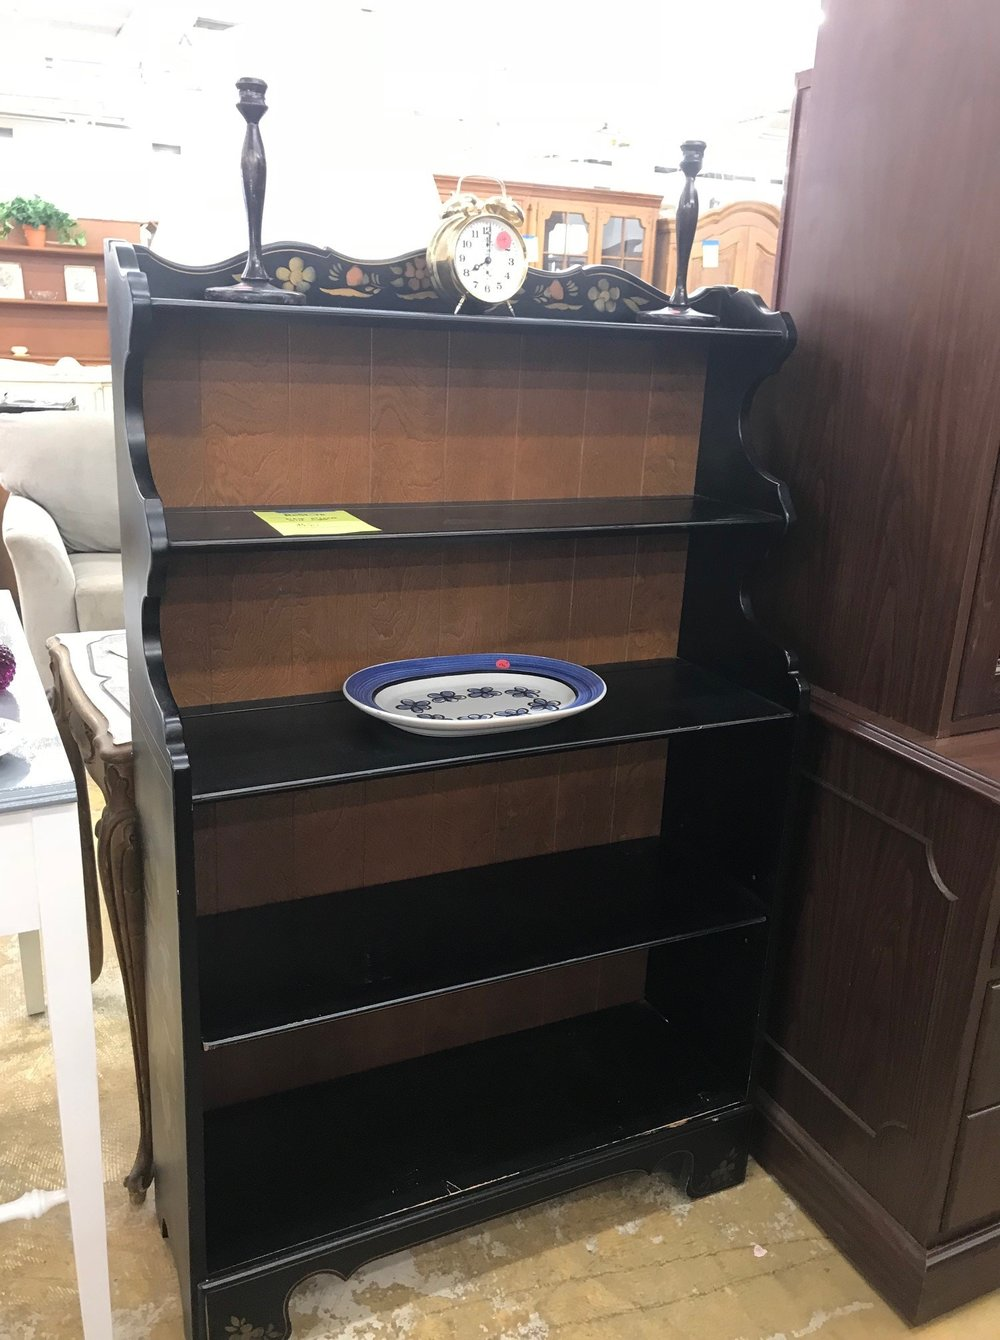 Habitat ReStore Bergen NJ - Furniture for Sale in NJ (8)-min.jpg